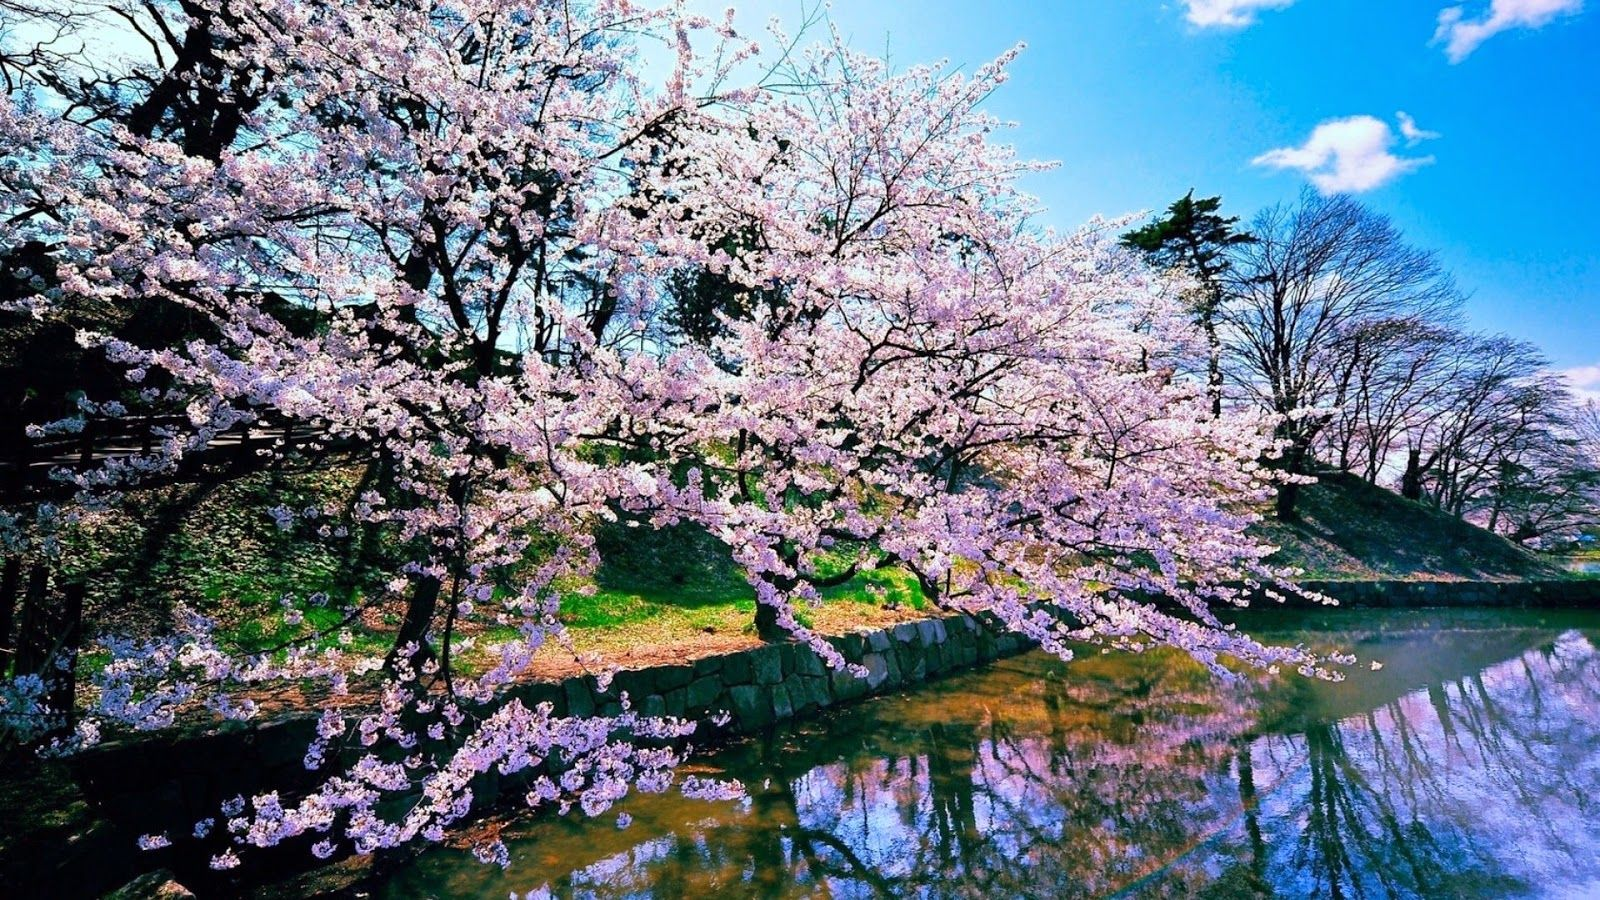 Japan Nature Wallpapers Top Free Japan Nature Backgrounds